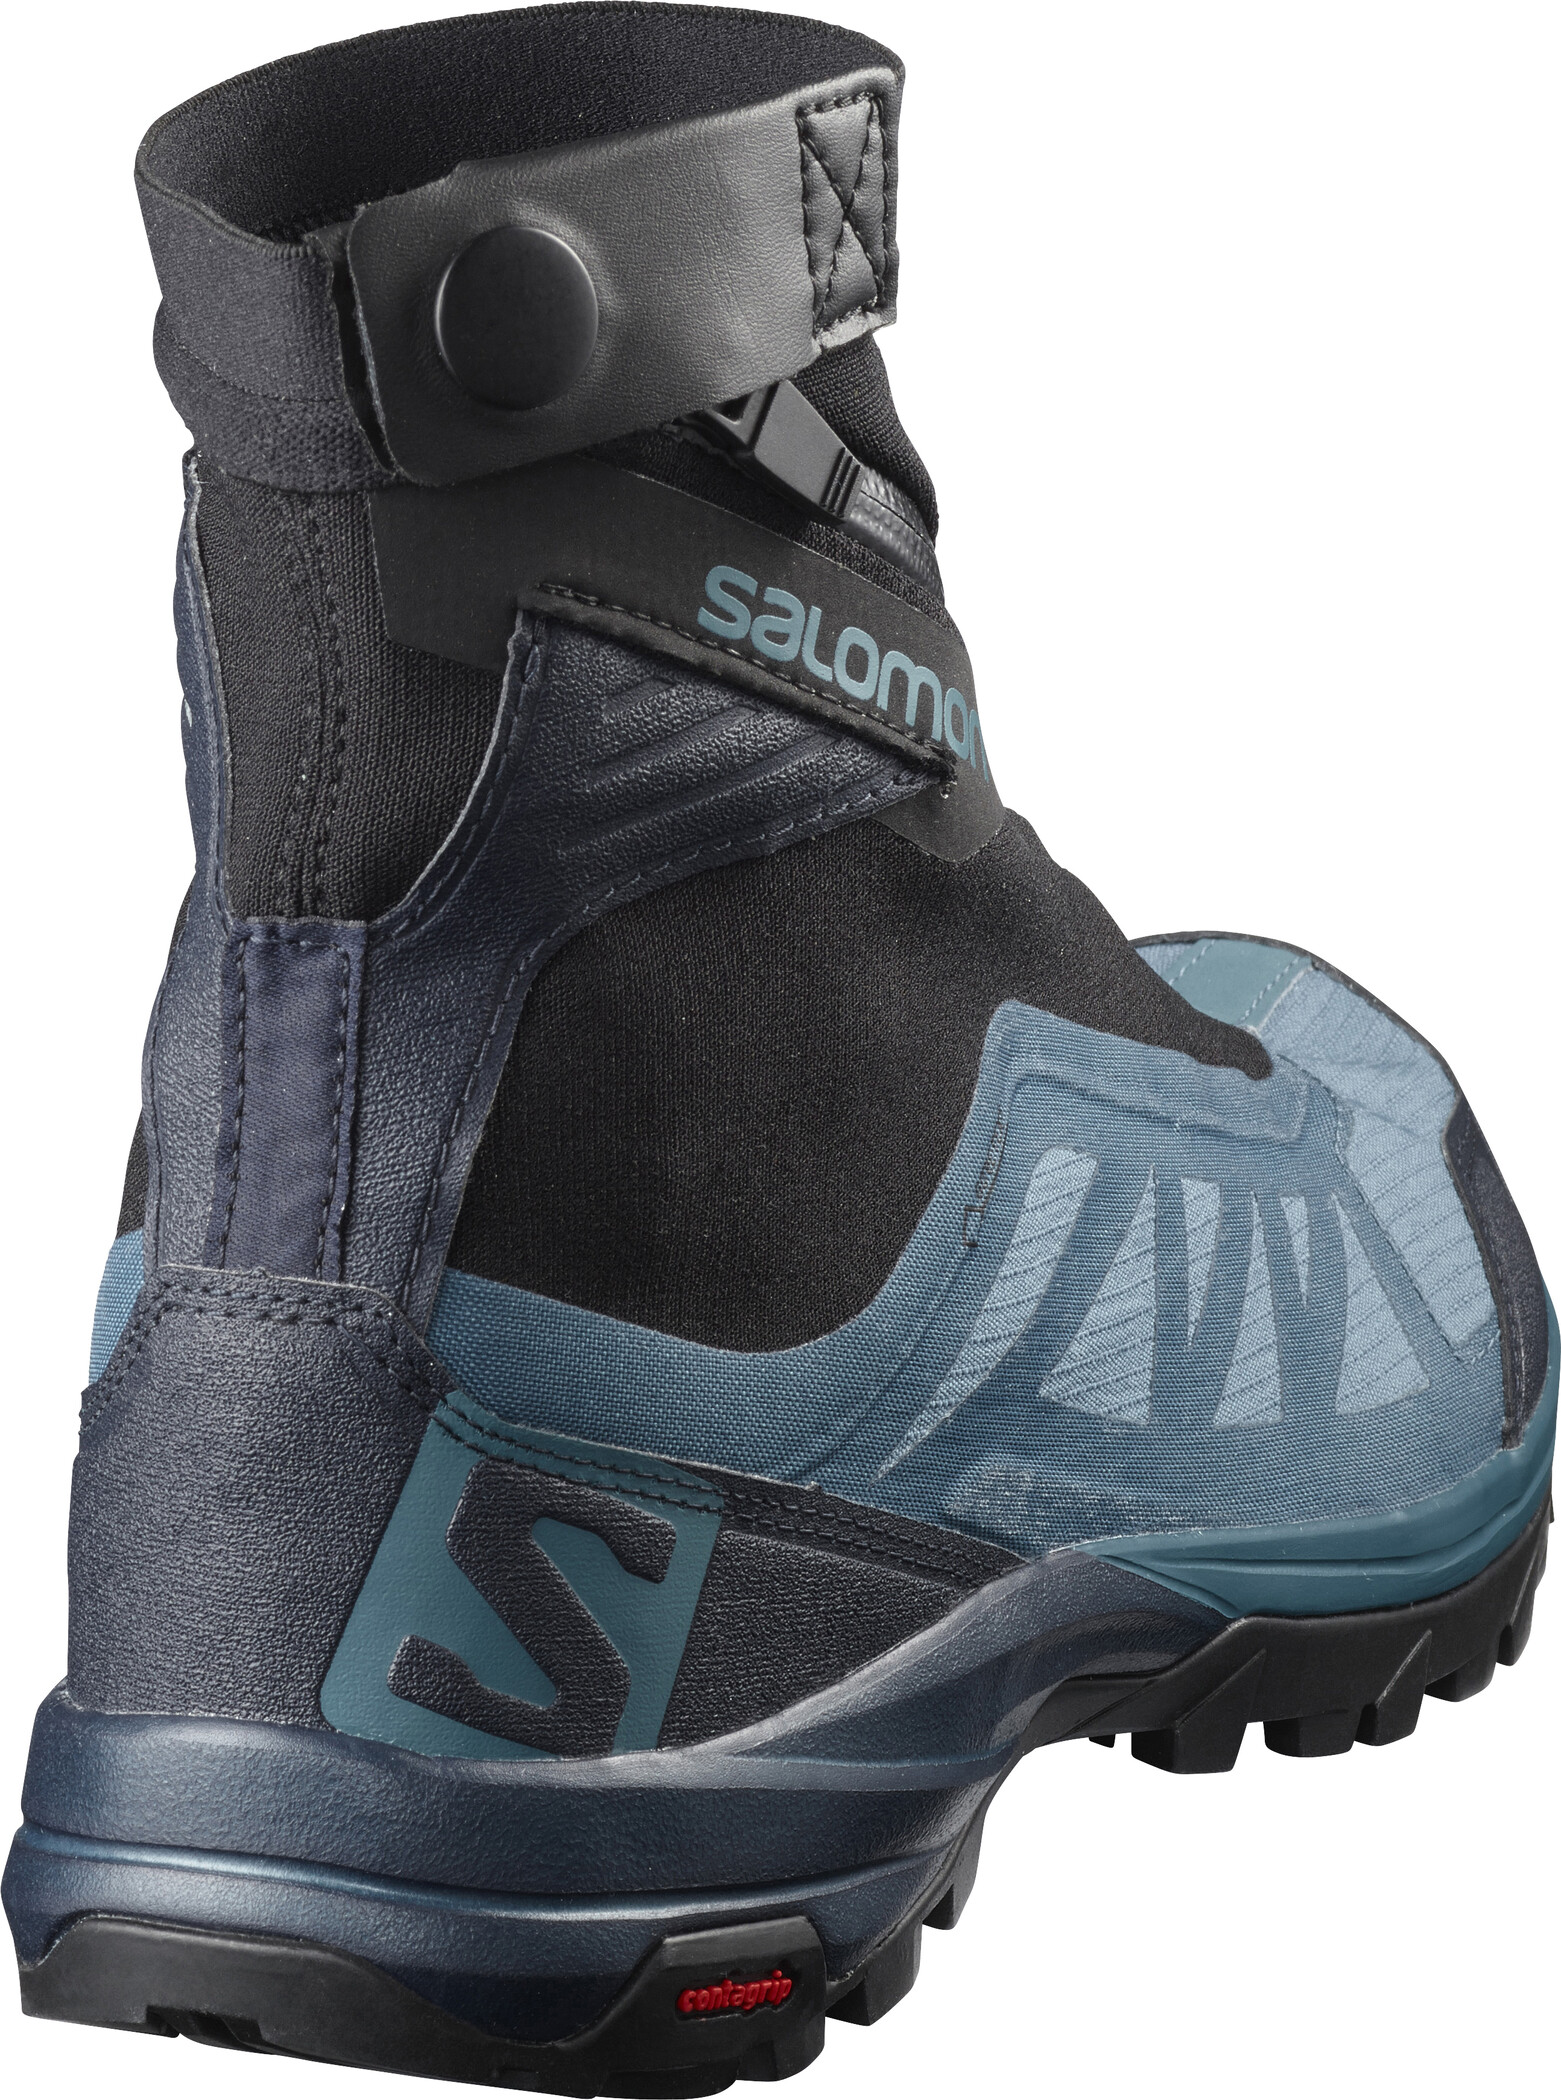 Salomon Outpath Pro GTX Shoes Dam mallard bluenavy blazerblack